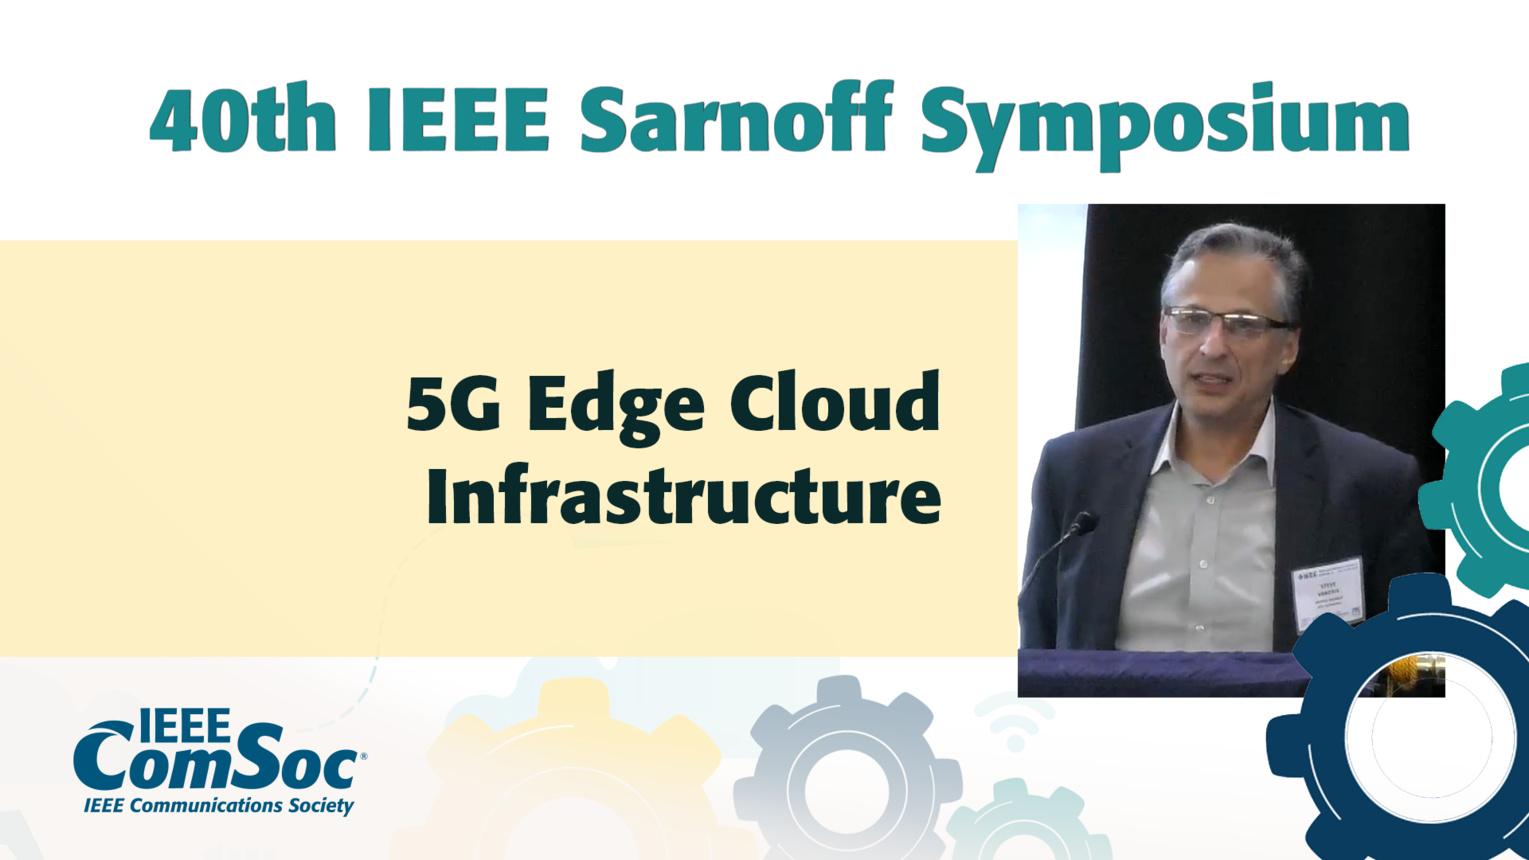 5G Edge Cloud Infrastructure - Steve Vandris - IEEE Sarnoff Symposium, 2019